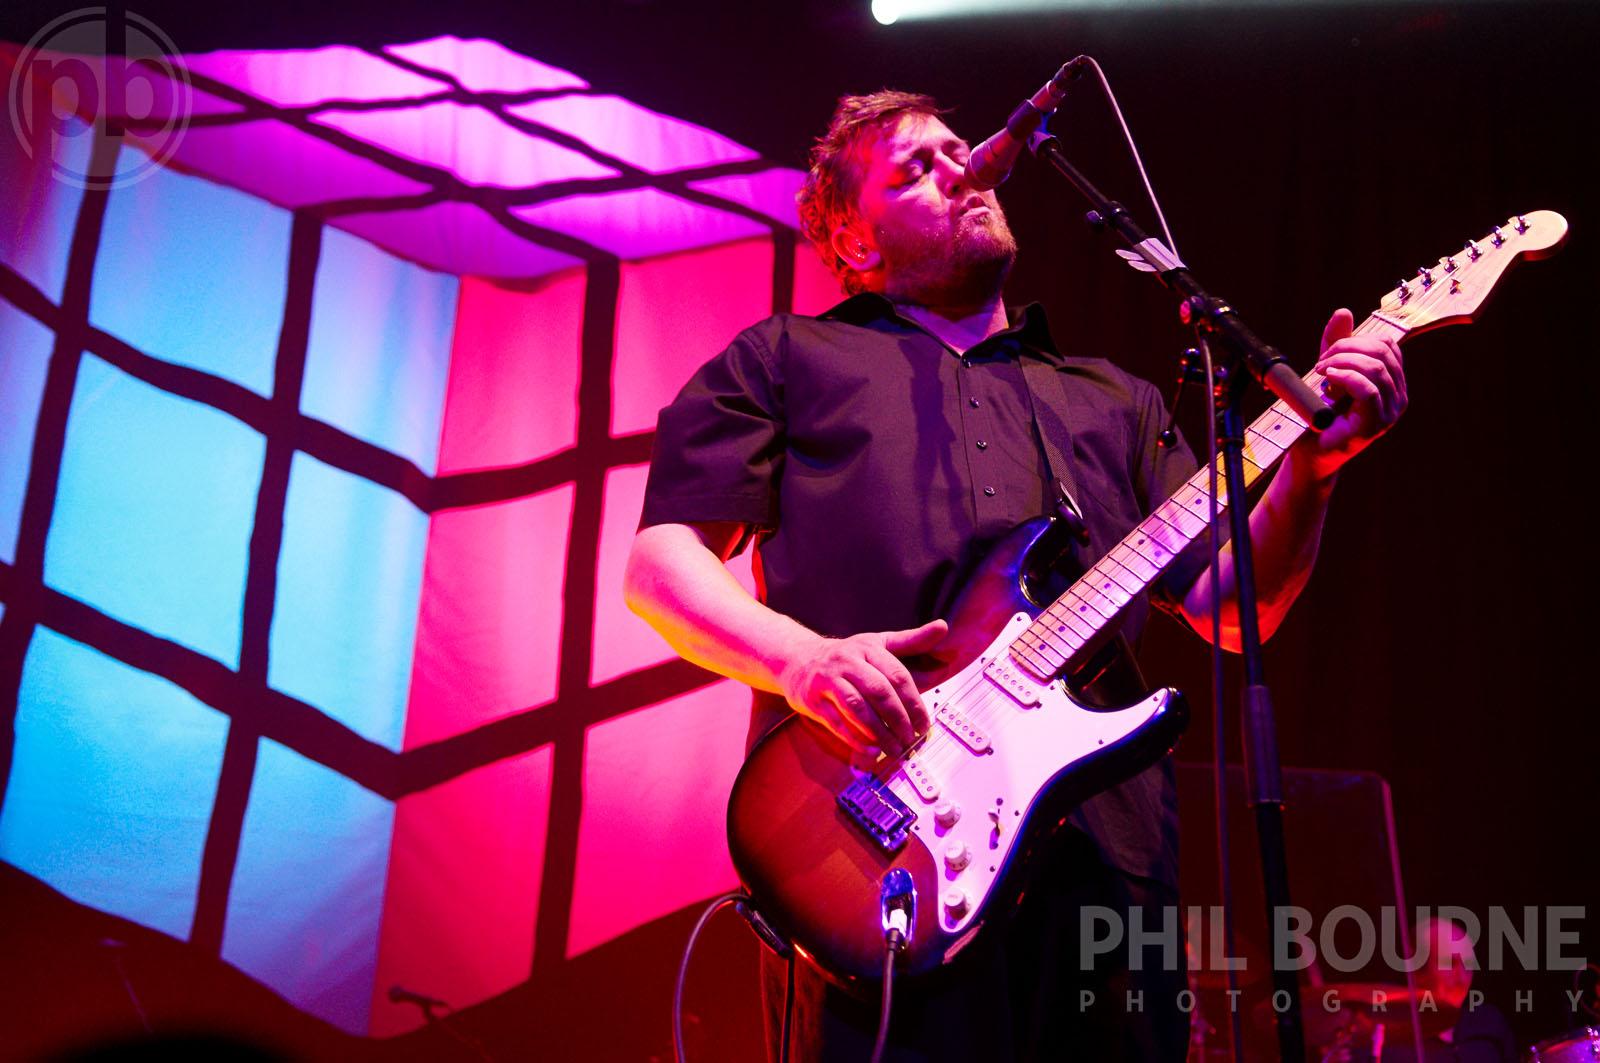 044_Live_Music_Photographer_London_Elbow_001.jpg